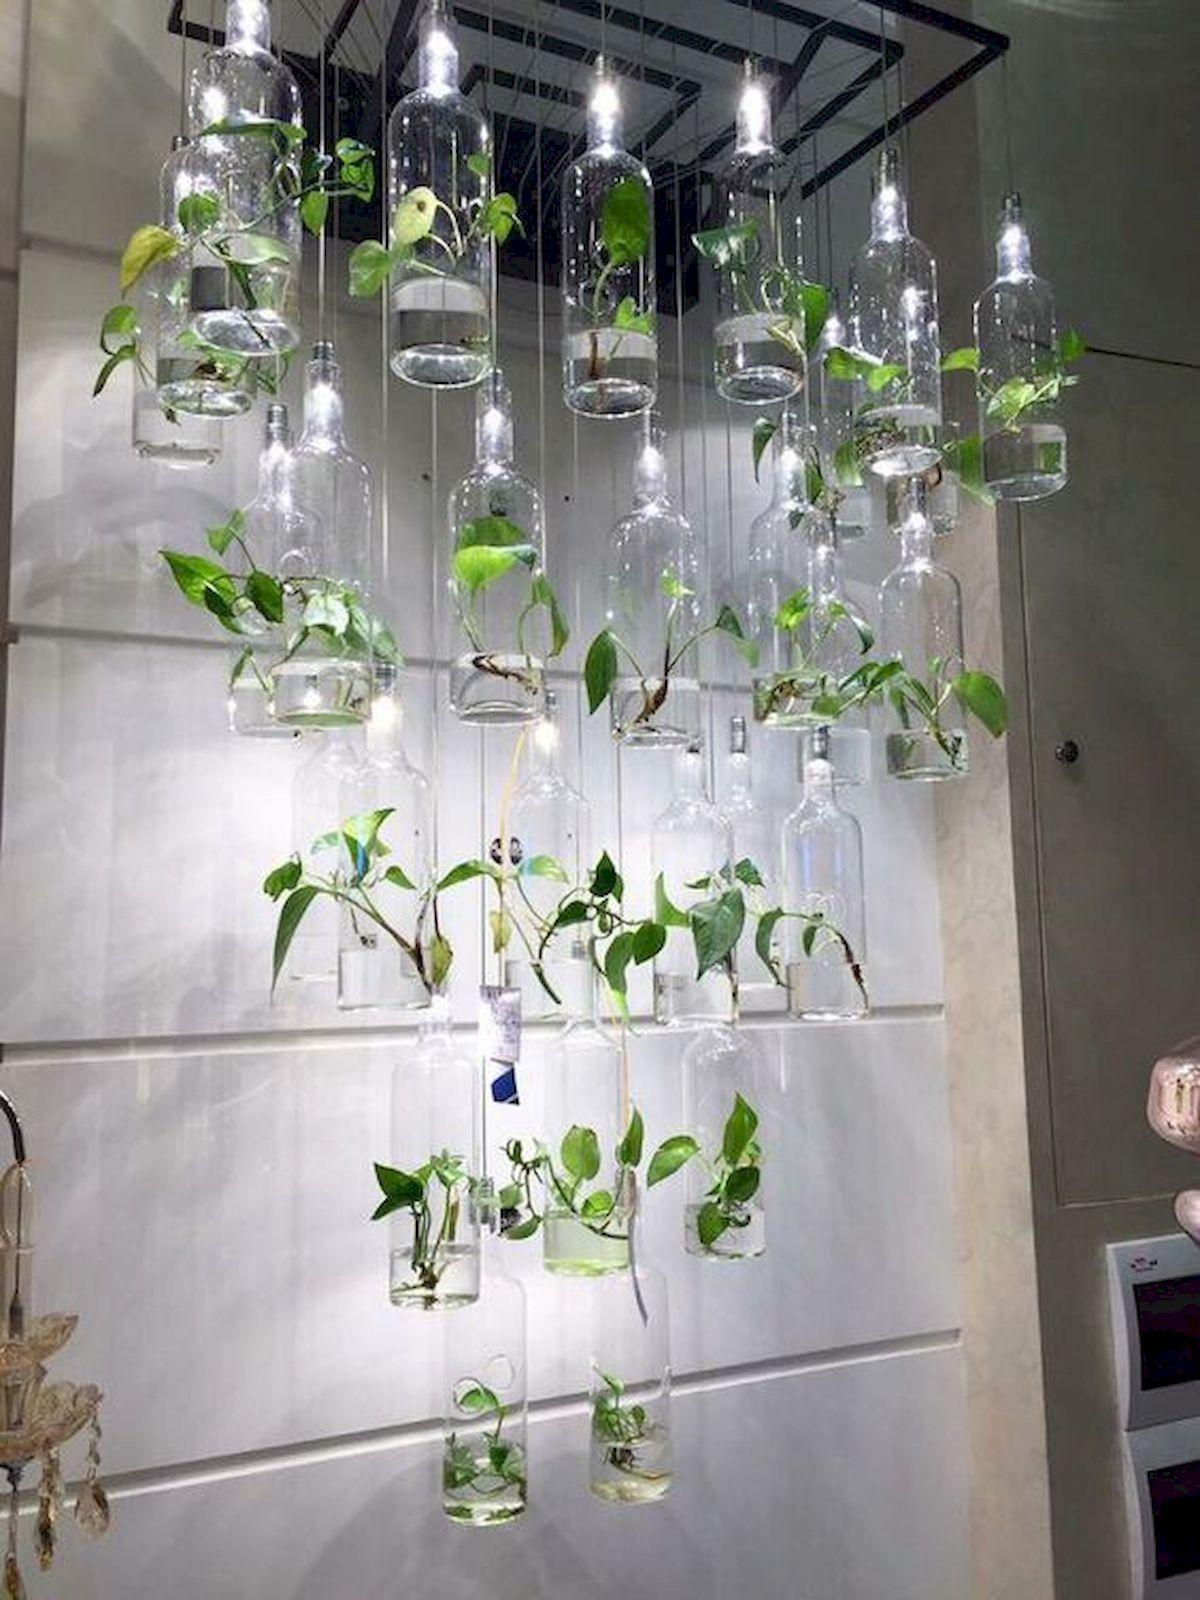 70 Favorite Herb Garden Indoor Design Ideas For Summer Worldecor Co House Plants Decor Vertical Garden Indoor Plant Decor